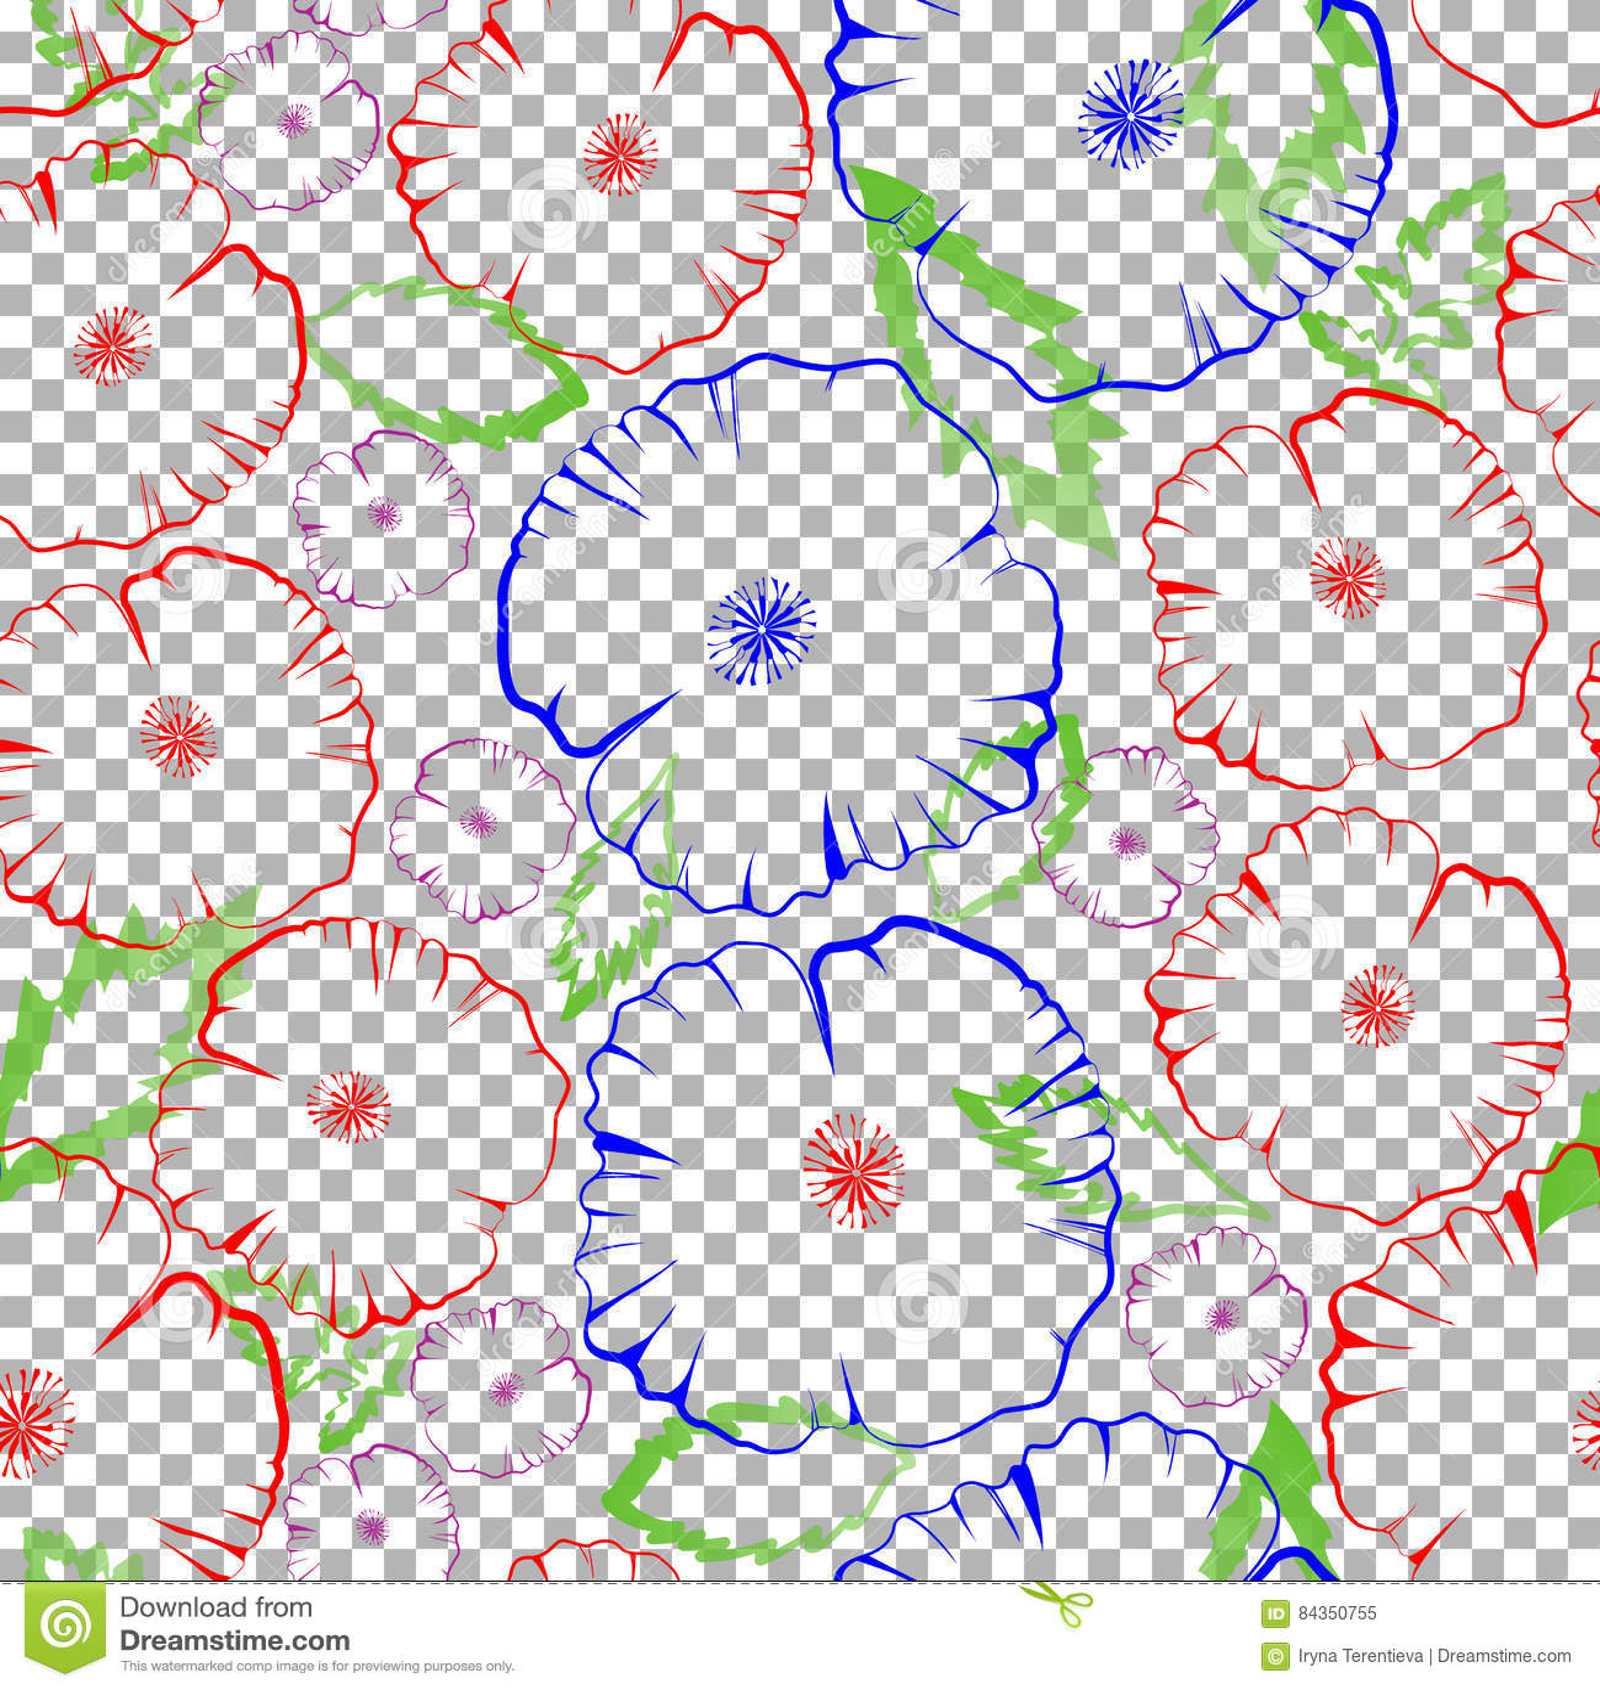 Transparent Patterns Best Inspiration Design